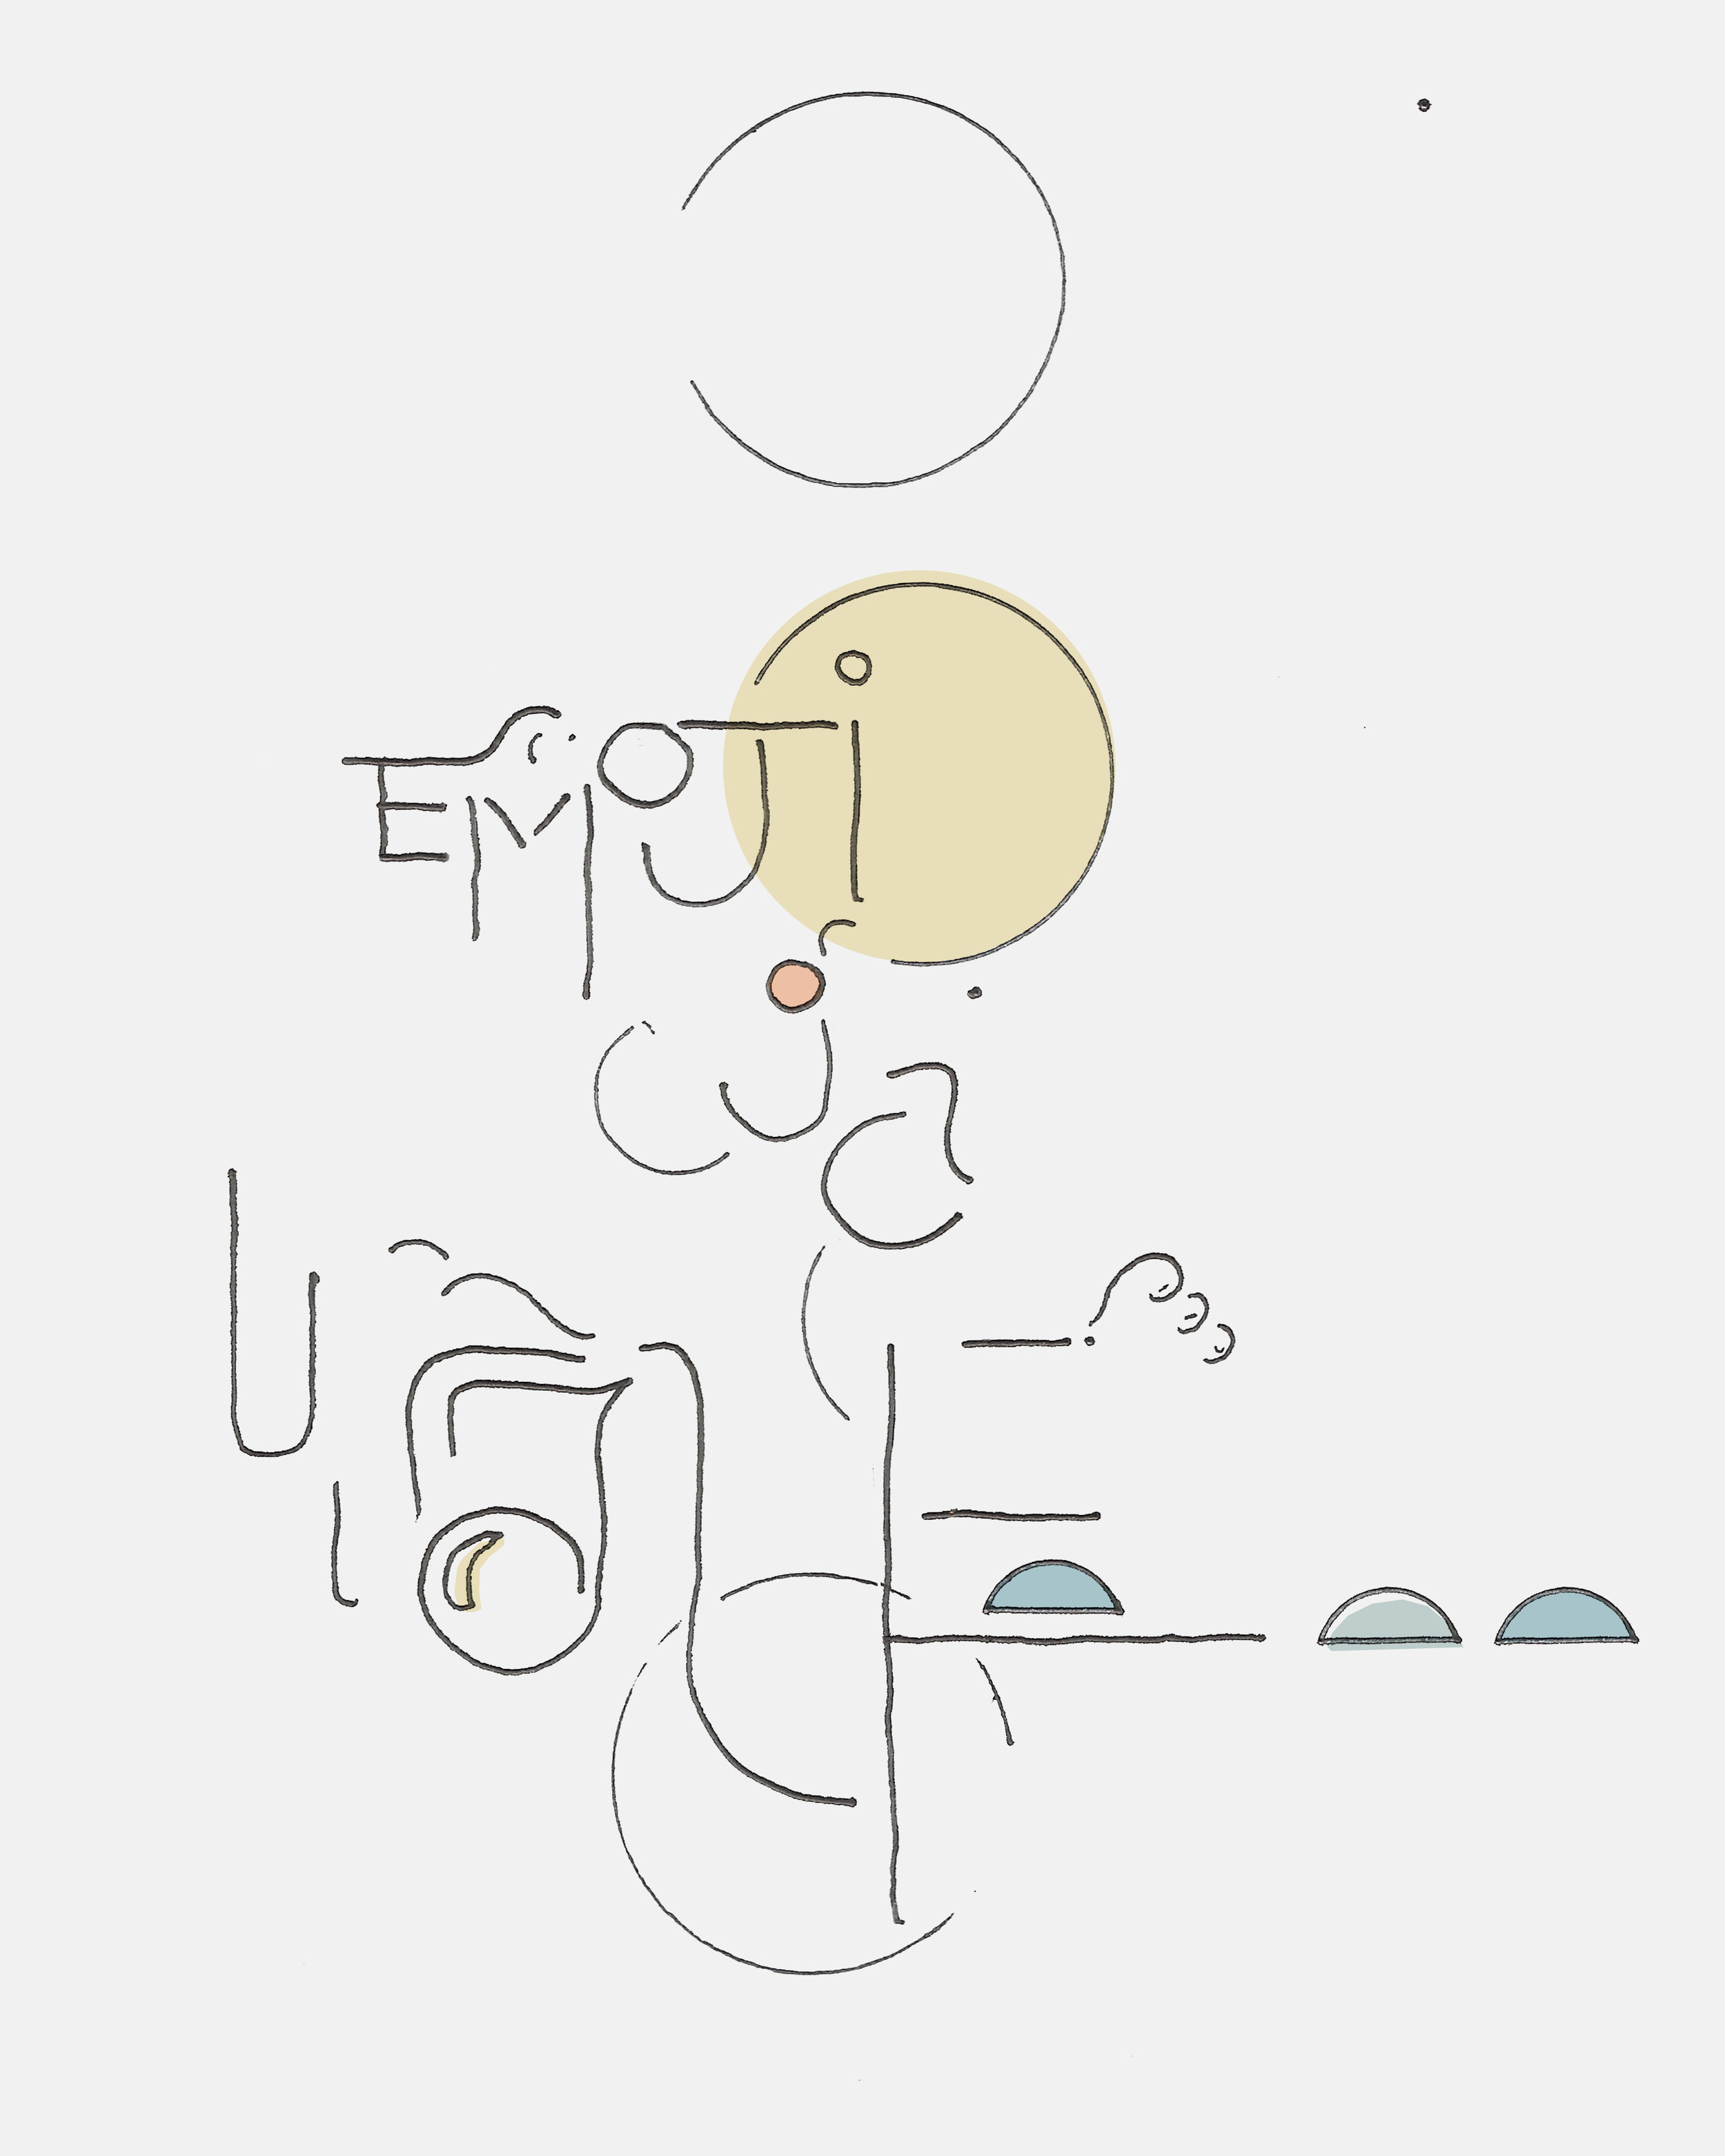 Emoji of a Wave.jpg